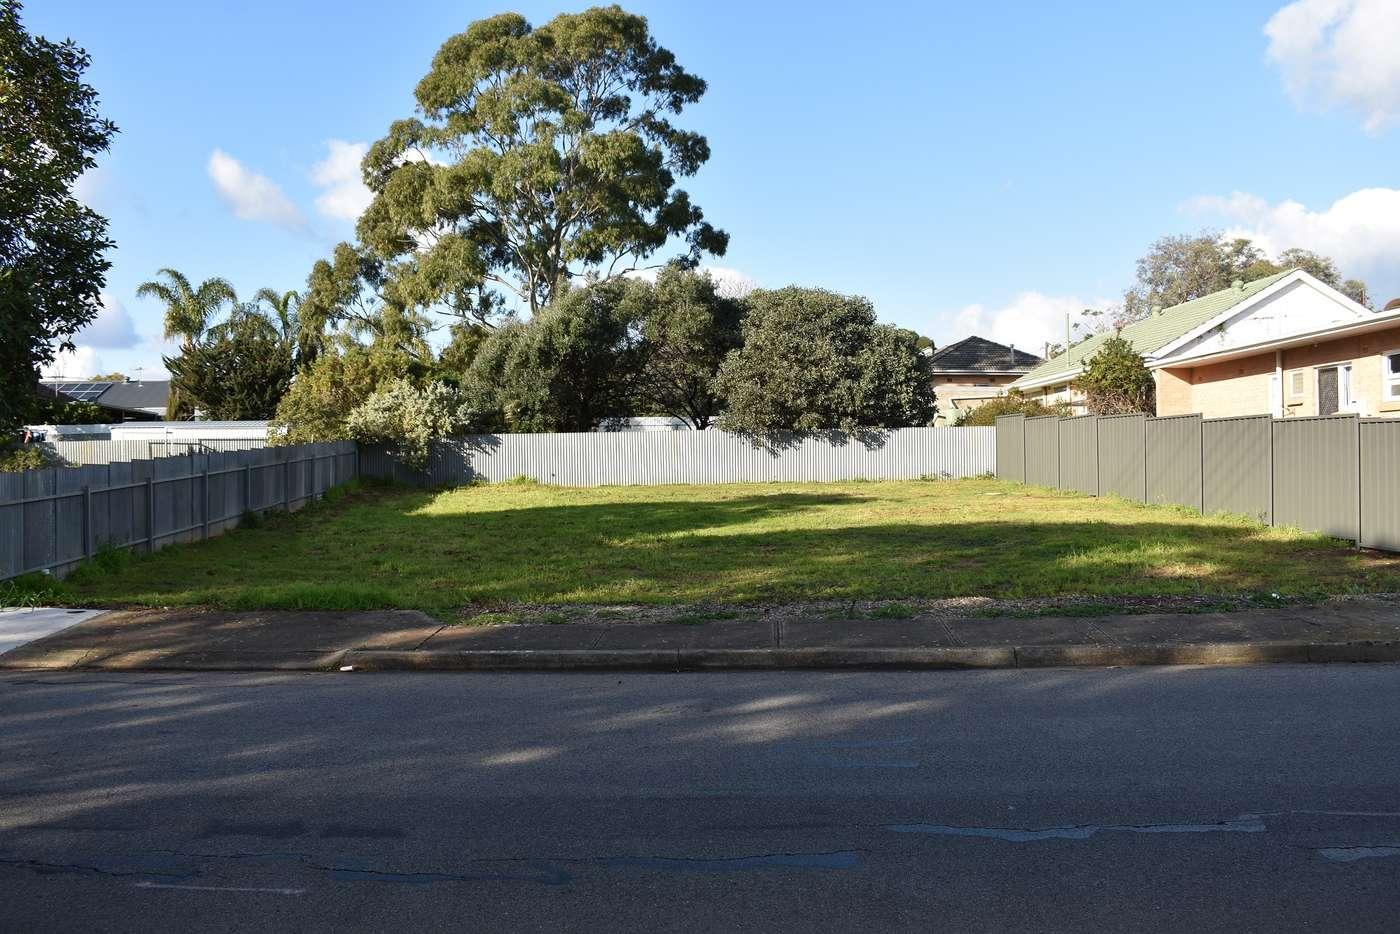 Main view of Homely residentialLand listing, 56 Trinity Road, Morphett Vale SA 5162